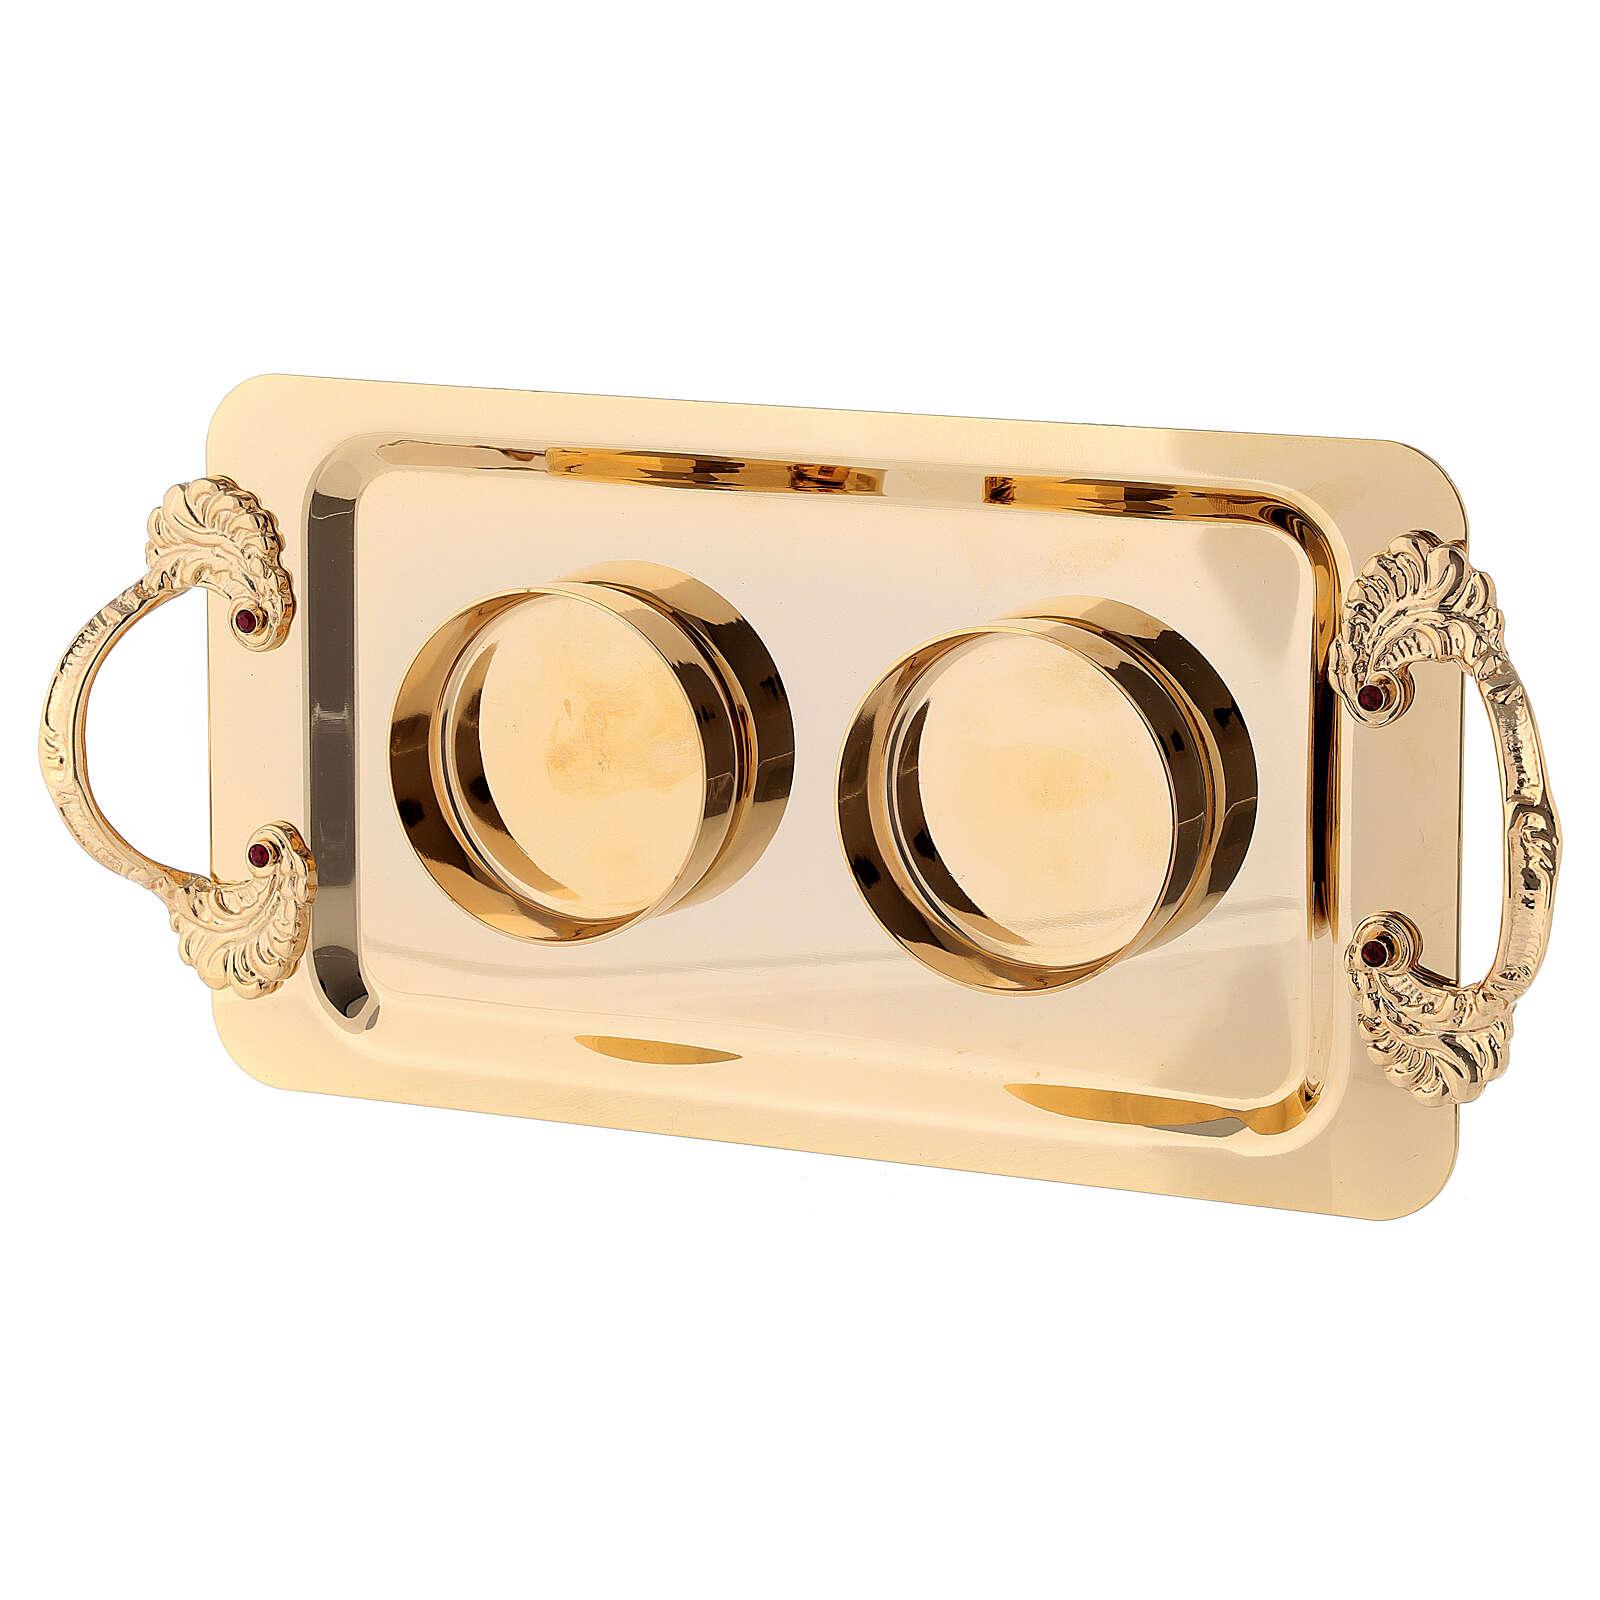 Fiesole cruets set of 24-karat gold plated brass 4